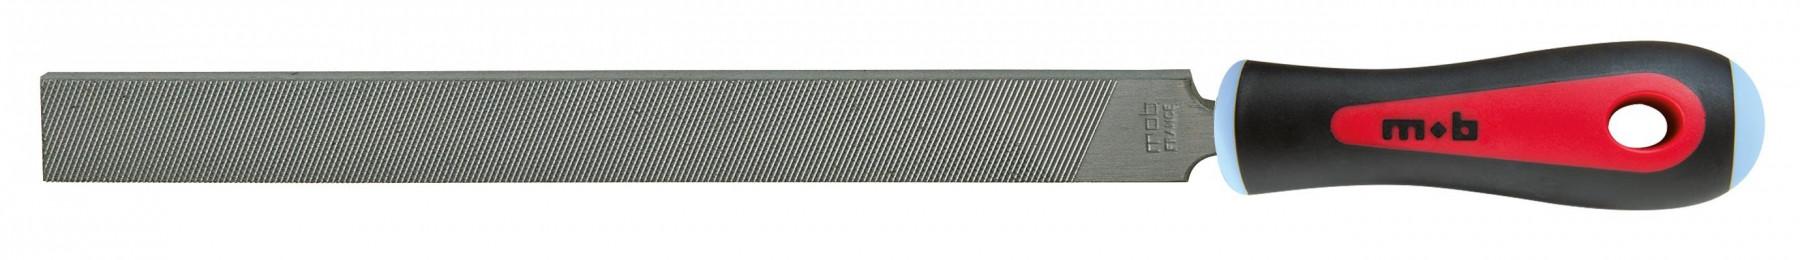 Lime plate 900 bâtarde MOB MONDELIN 300 x 30 x 7 mm - 0900308101